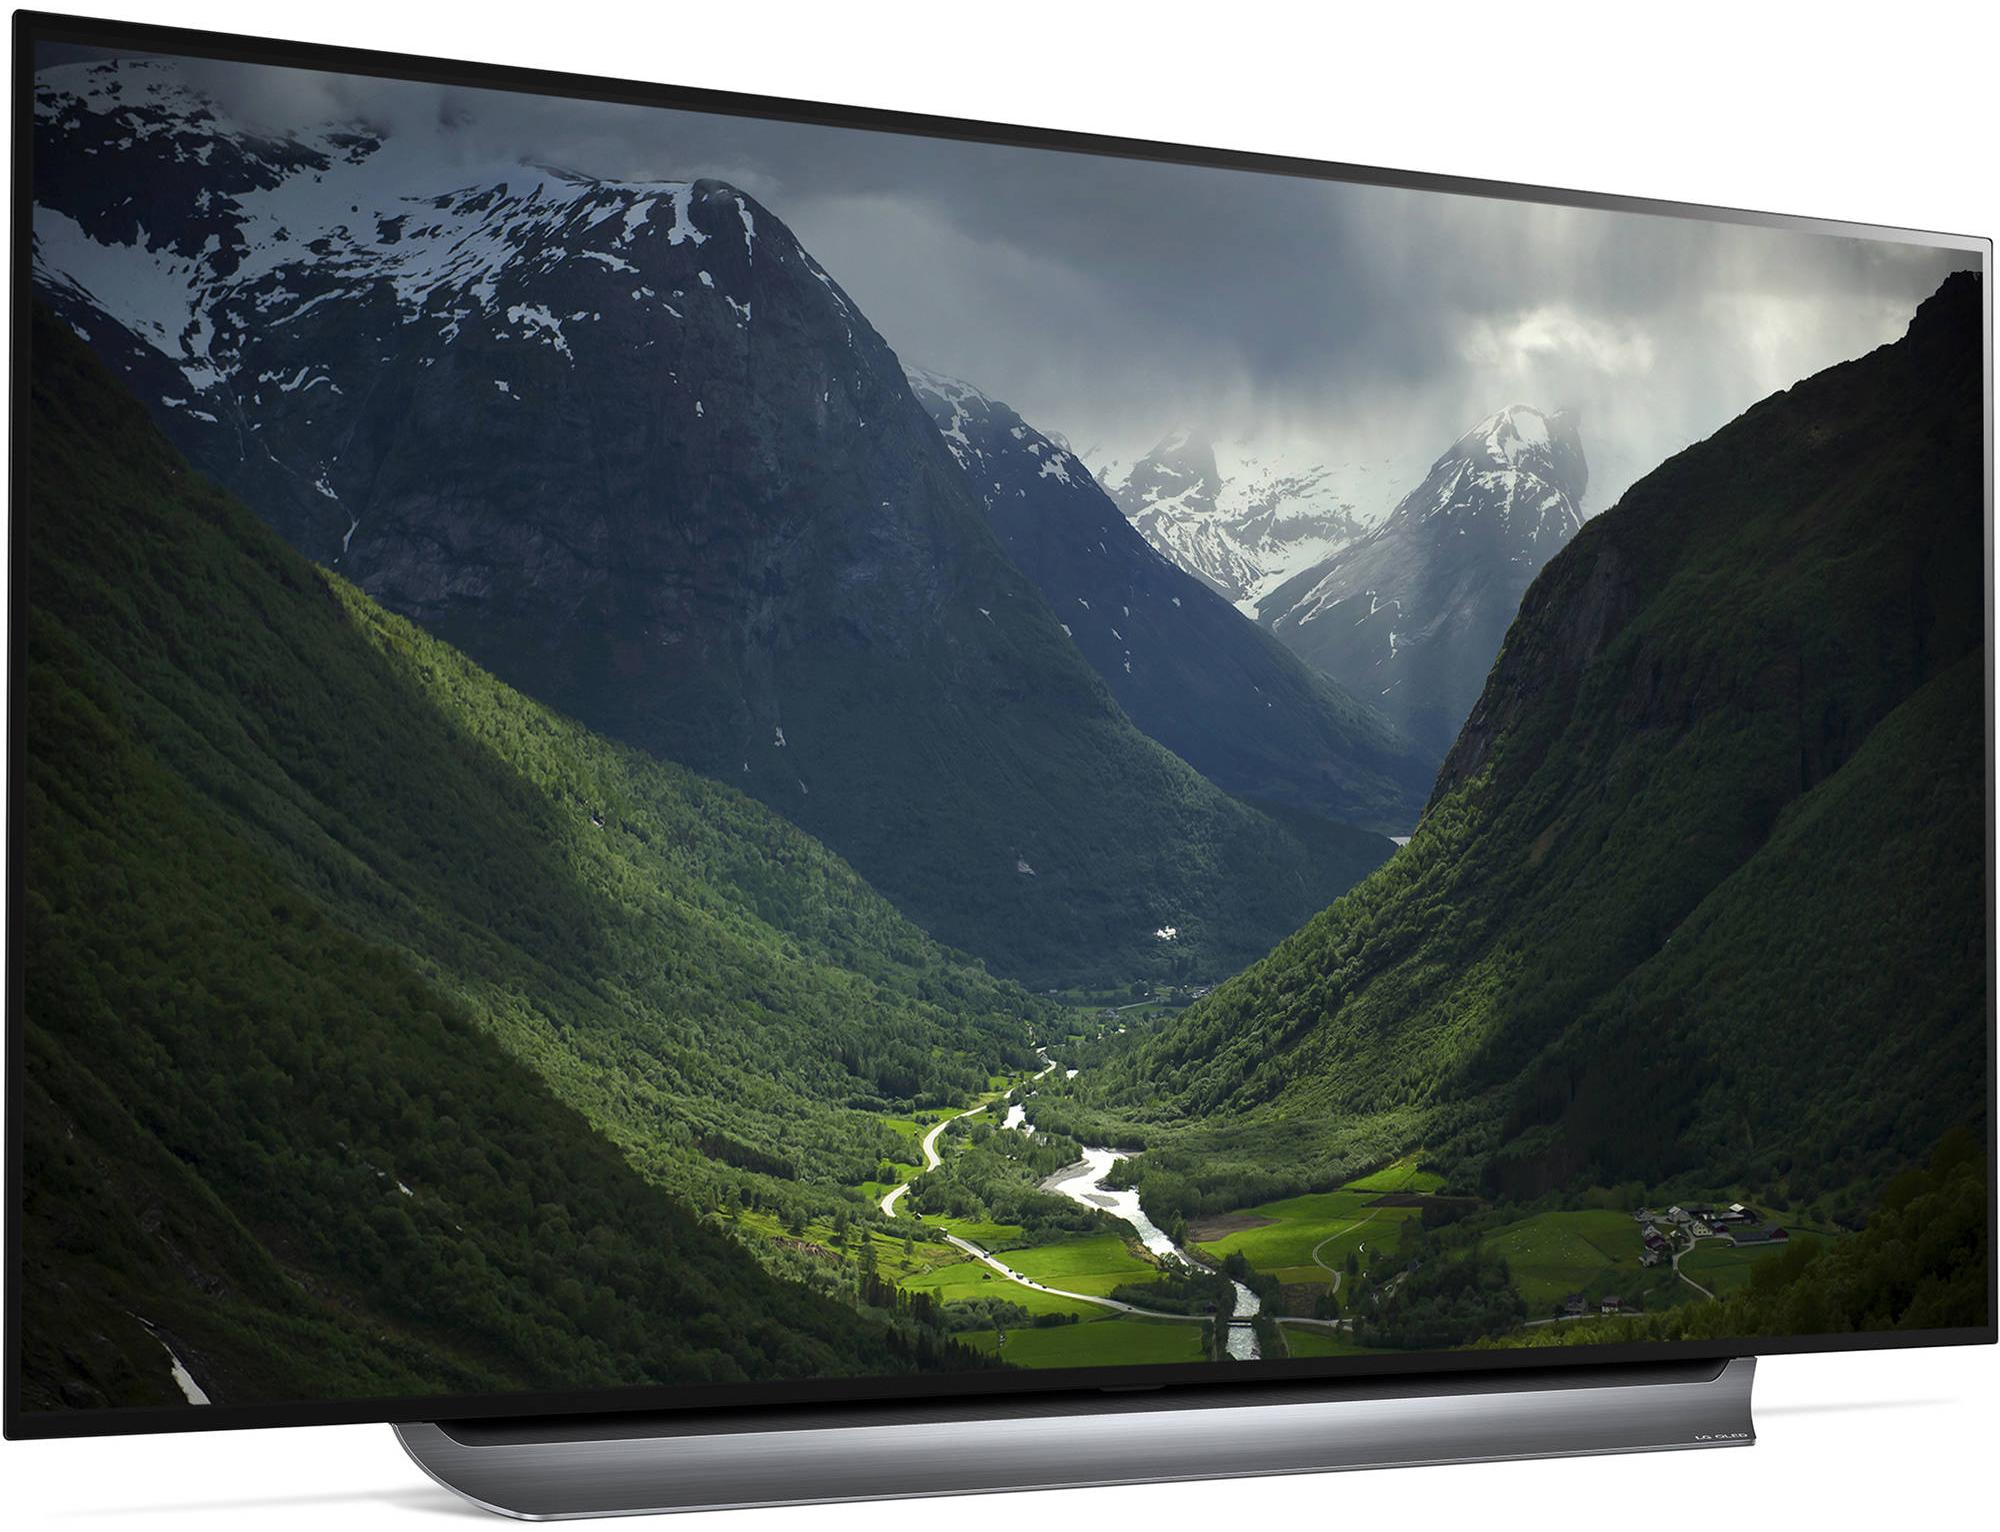 A Smarter Smart TV, Thanks to LG's AI ThinQ | B&H Explora